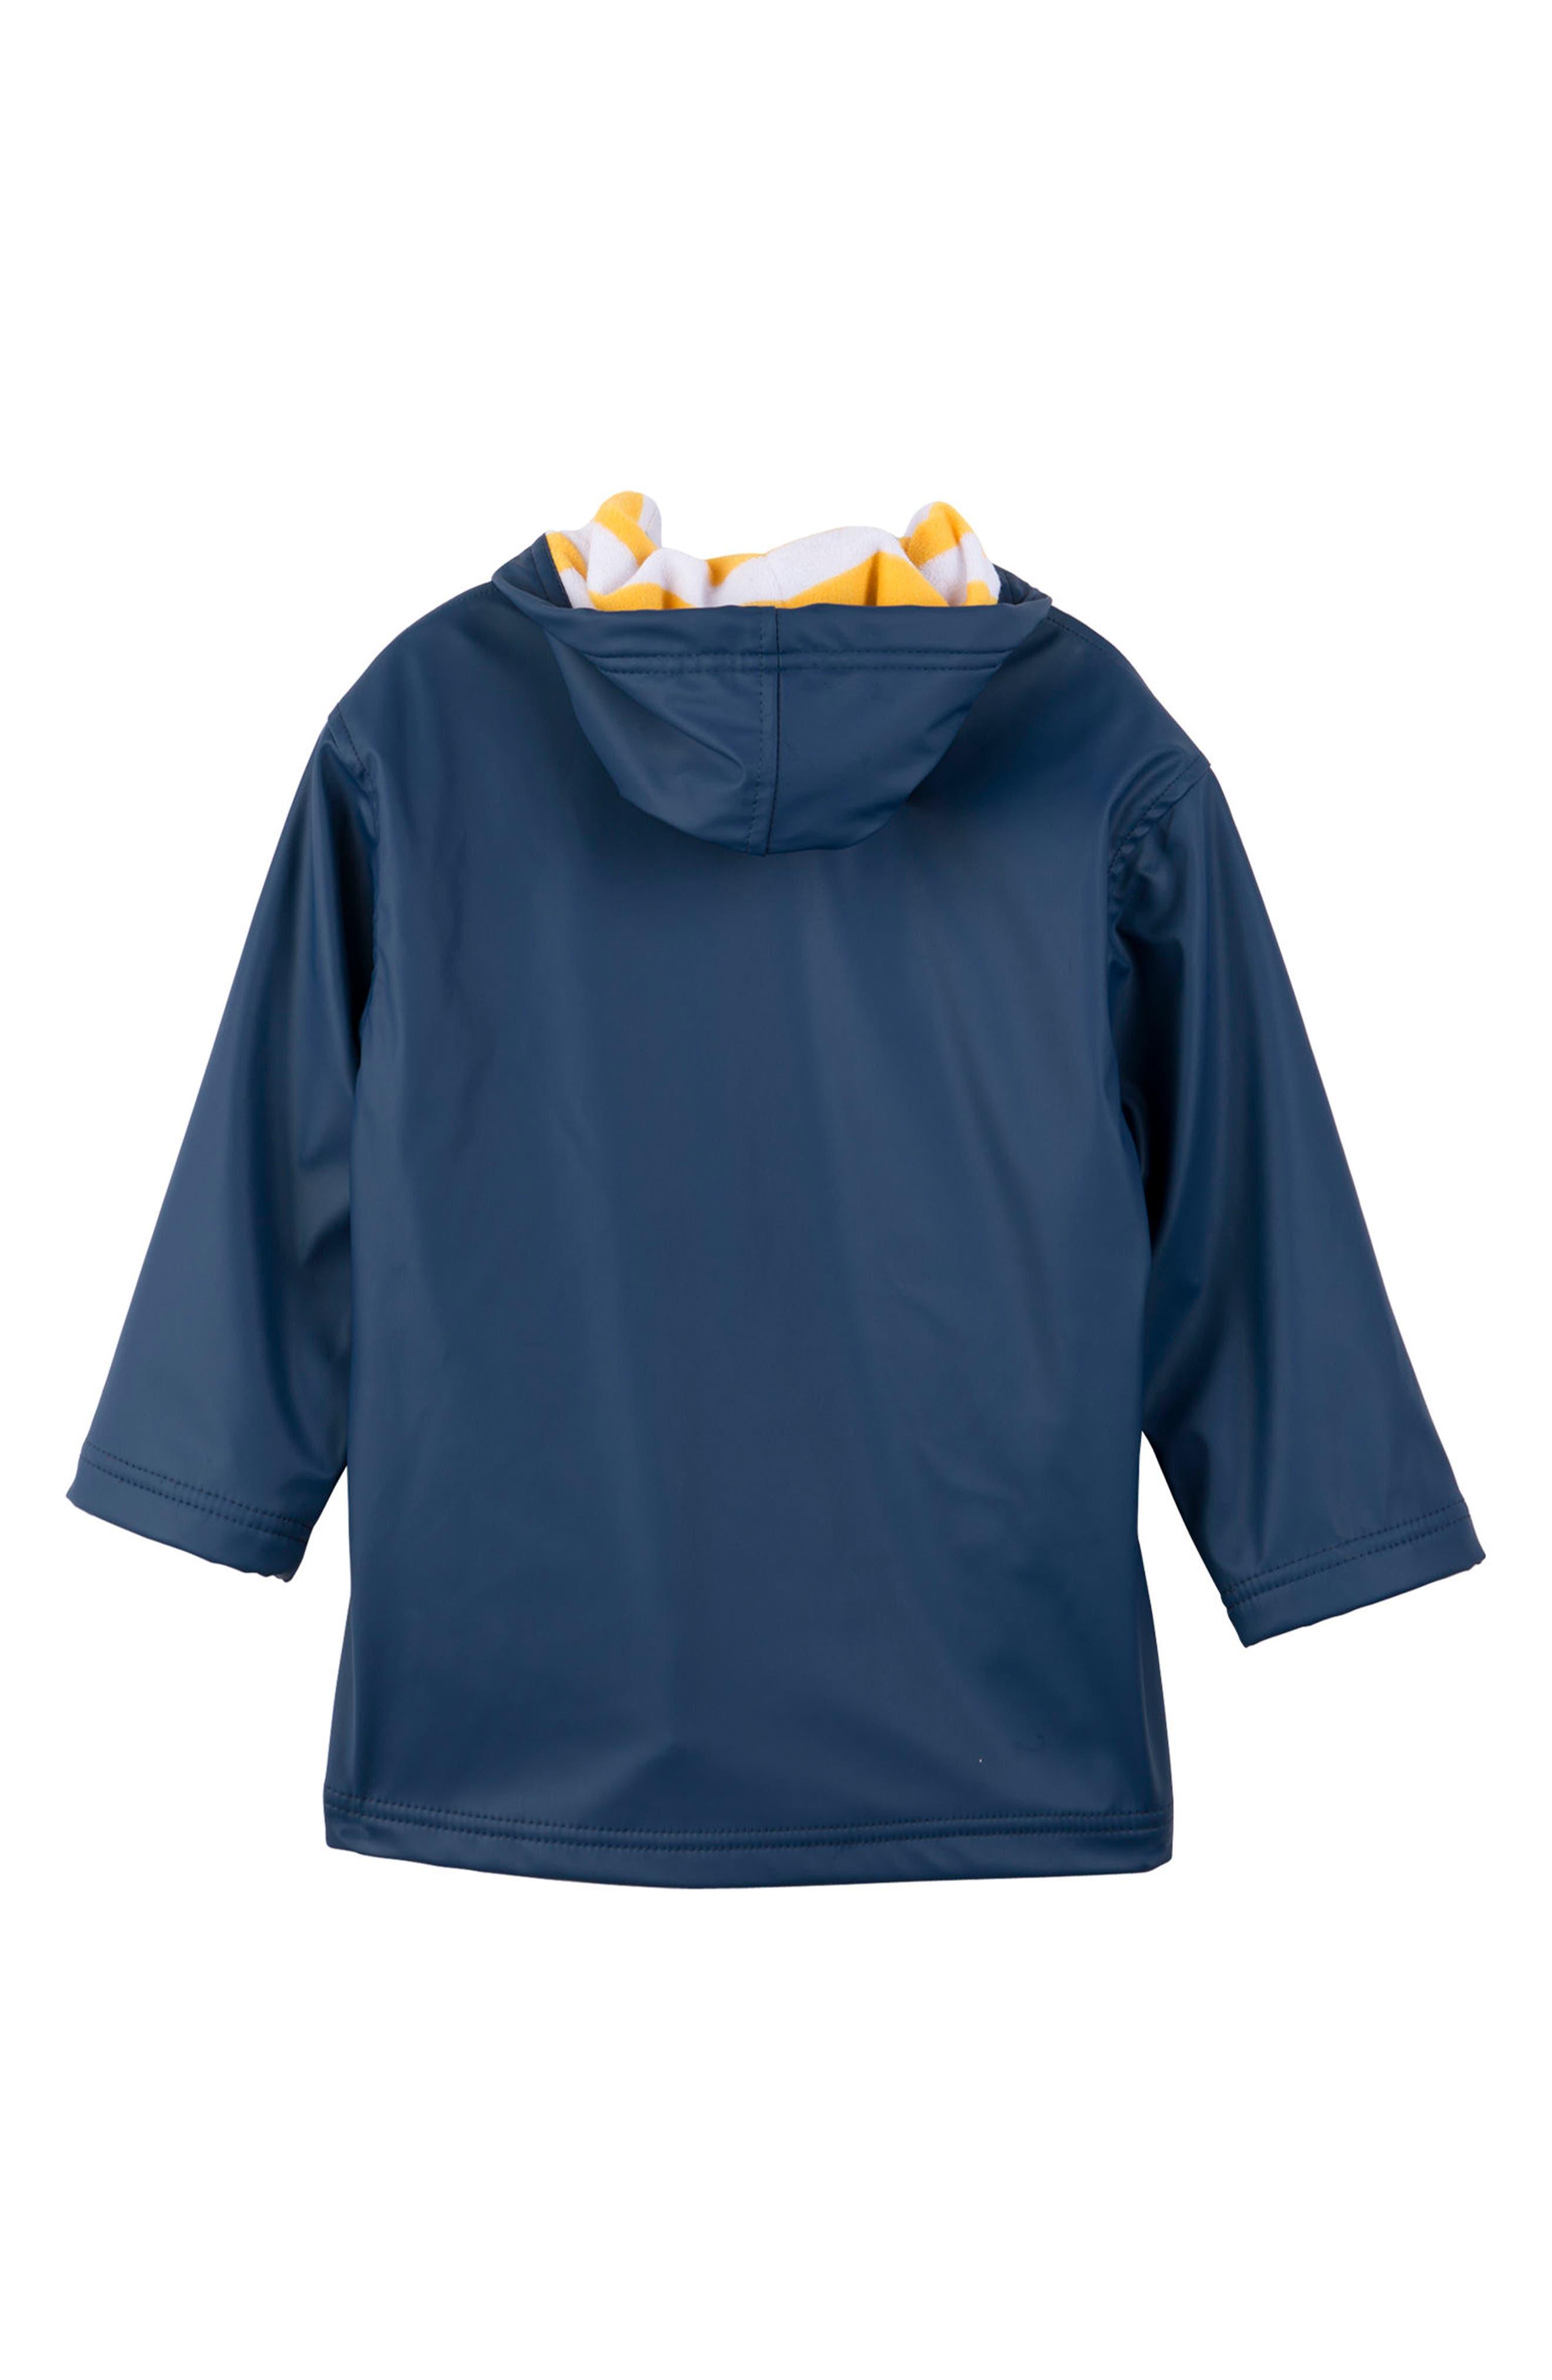 HATLEY, Splash Hooded Raincoat, Alternate thumbnail 2, color, NAVY/ YELLOW